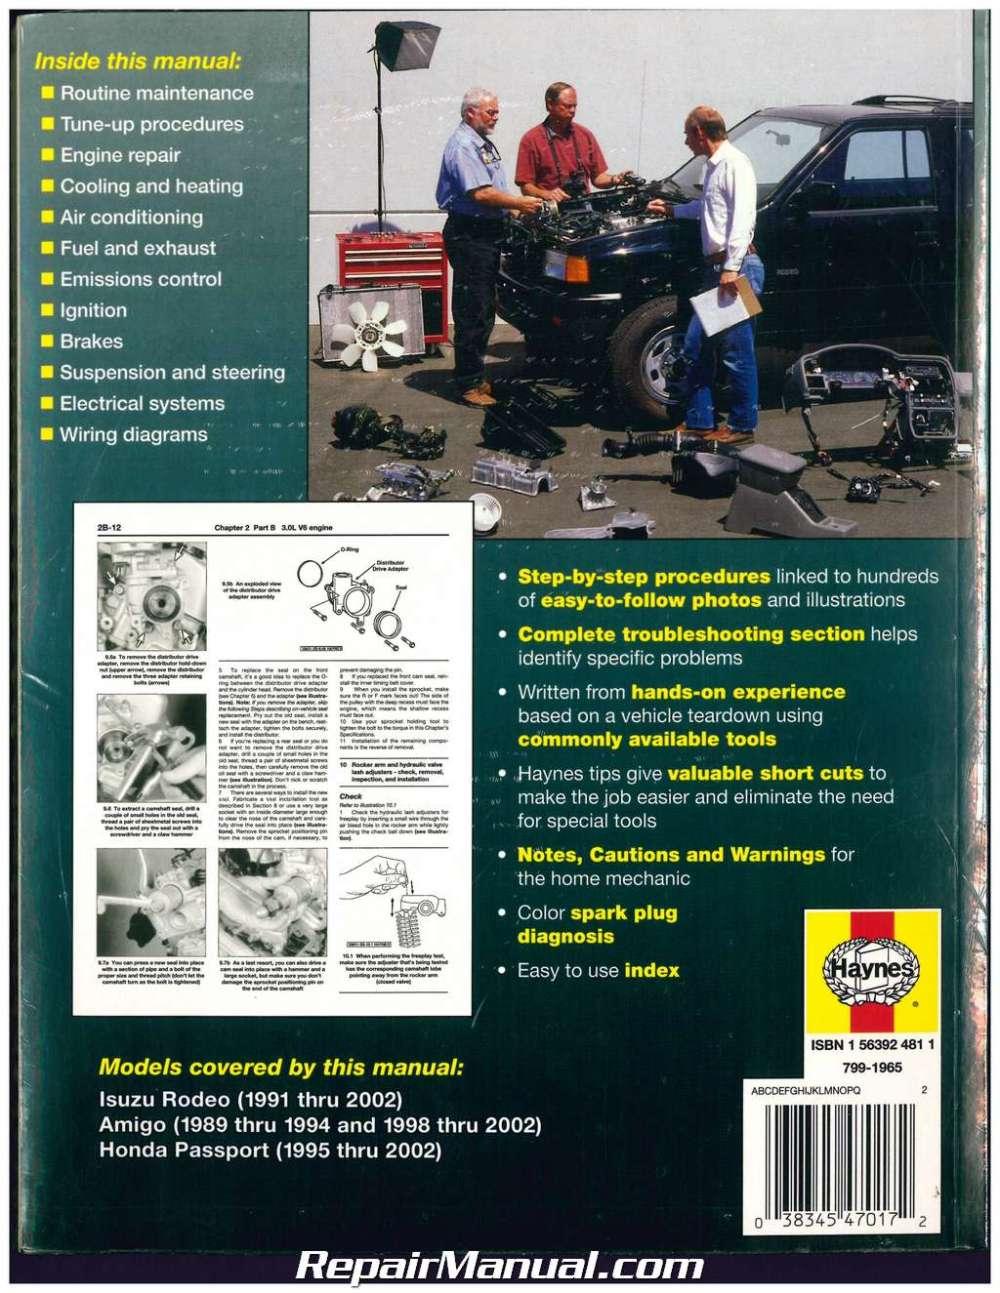 medium resolution of isuzu rodeo amigo honda passport 1989 2002 haynes automotive repair manual